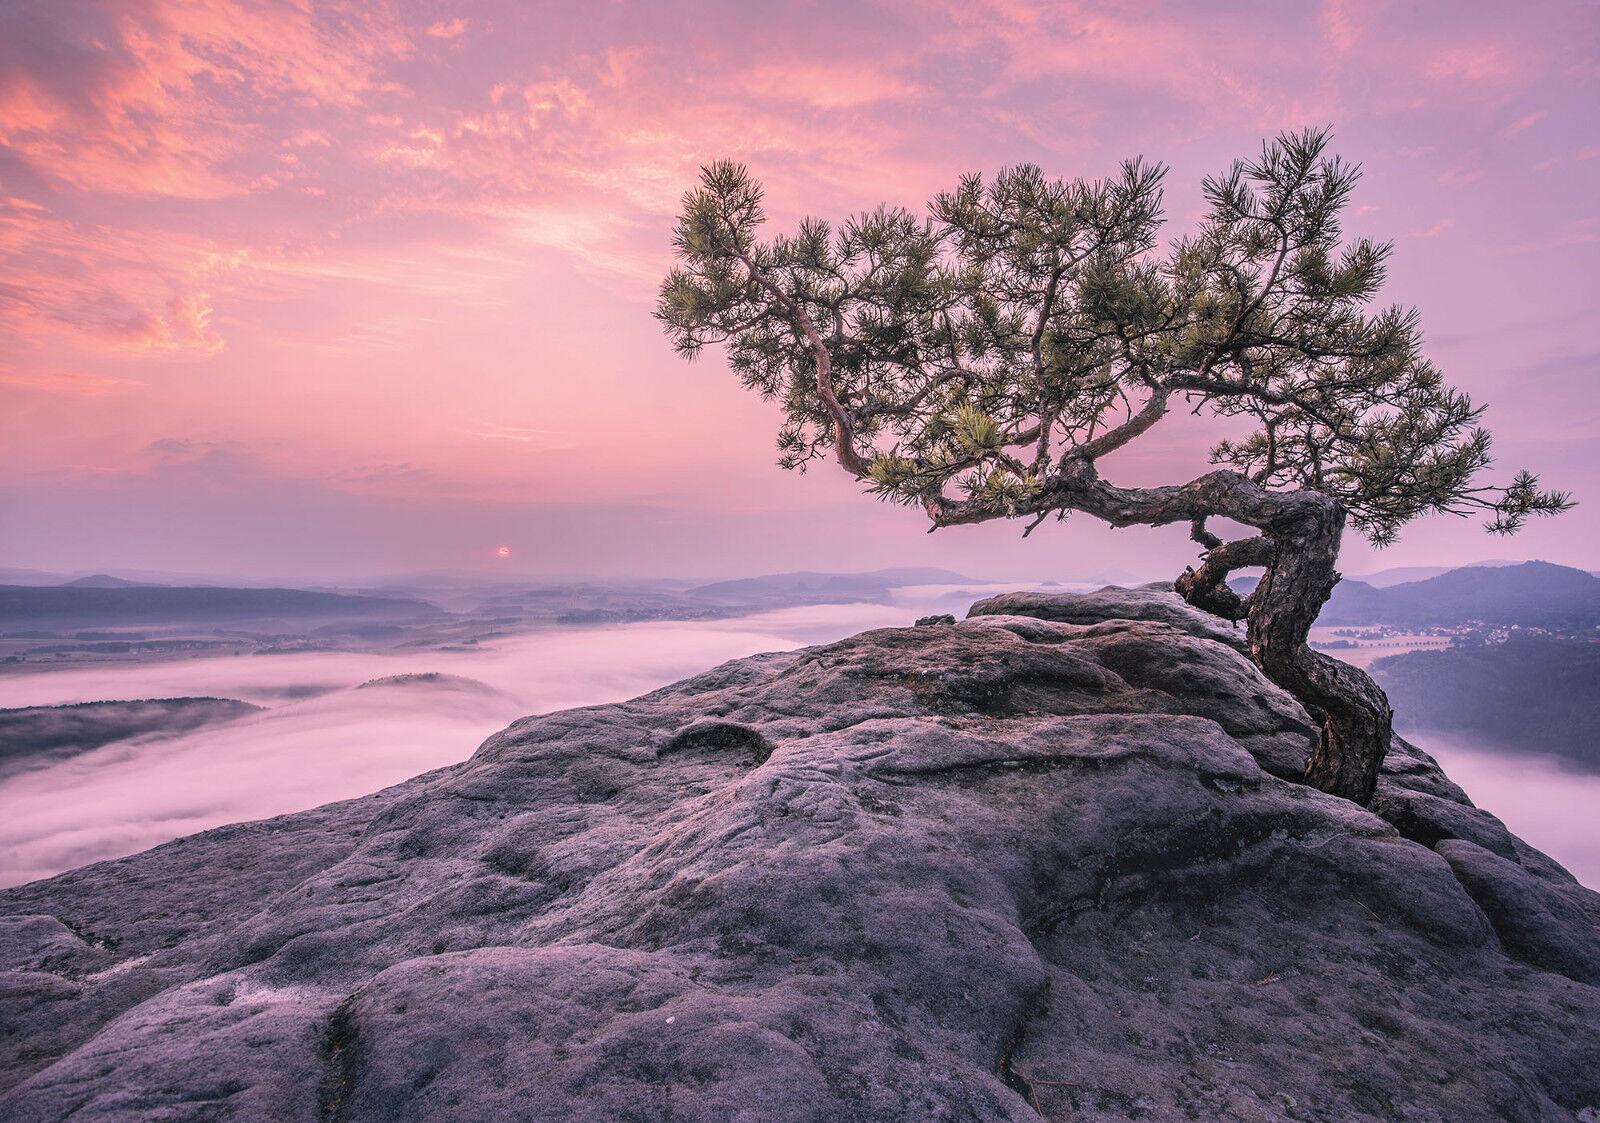 VLIES Fototapete-BAUM FELSEN-(11749)-Wolken Himmel Sonne Berge Skyline Mural XXL